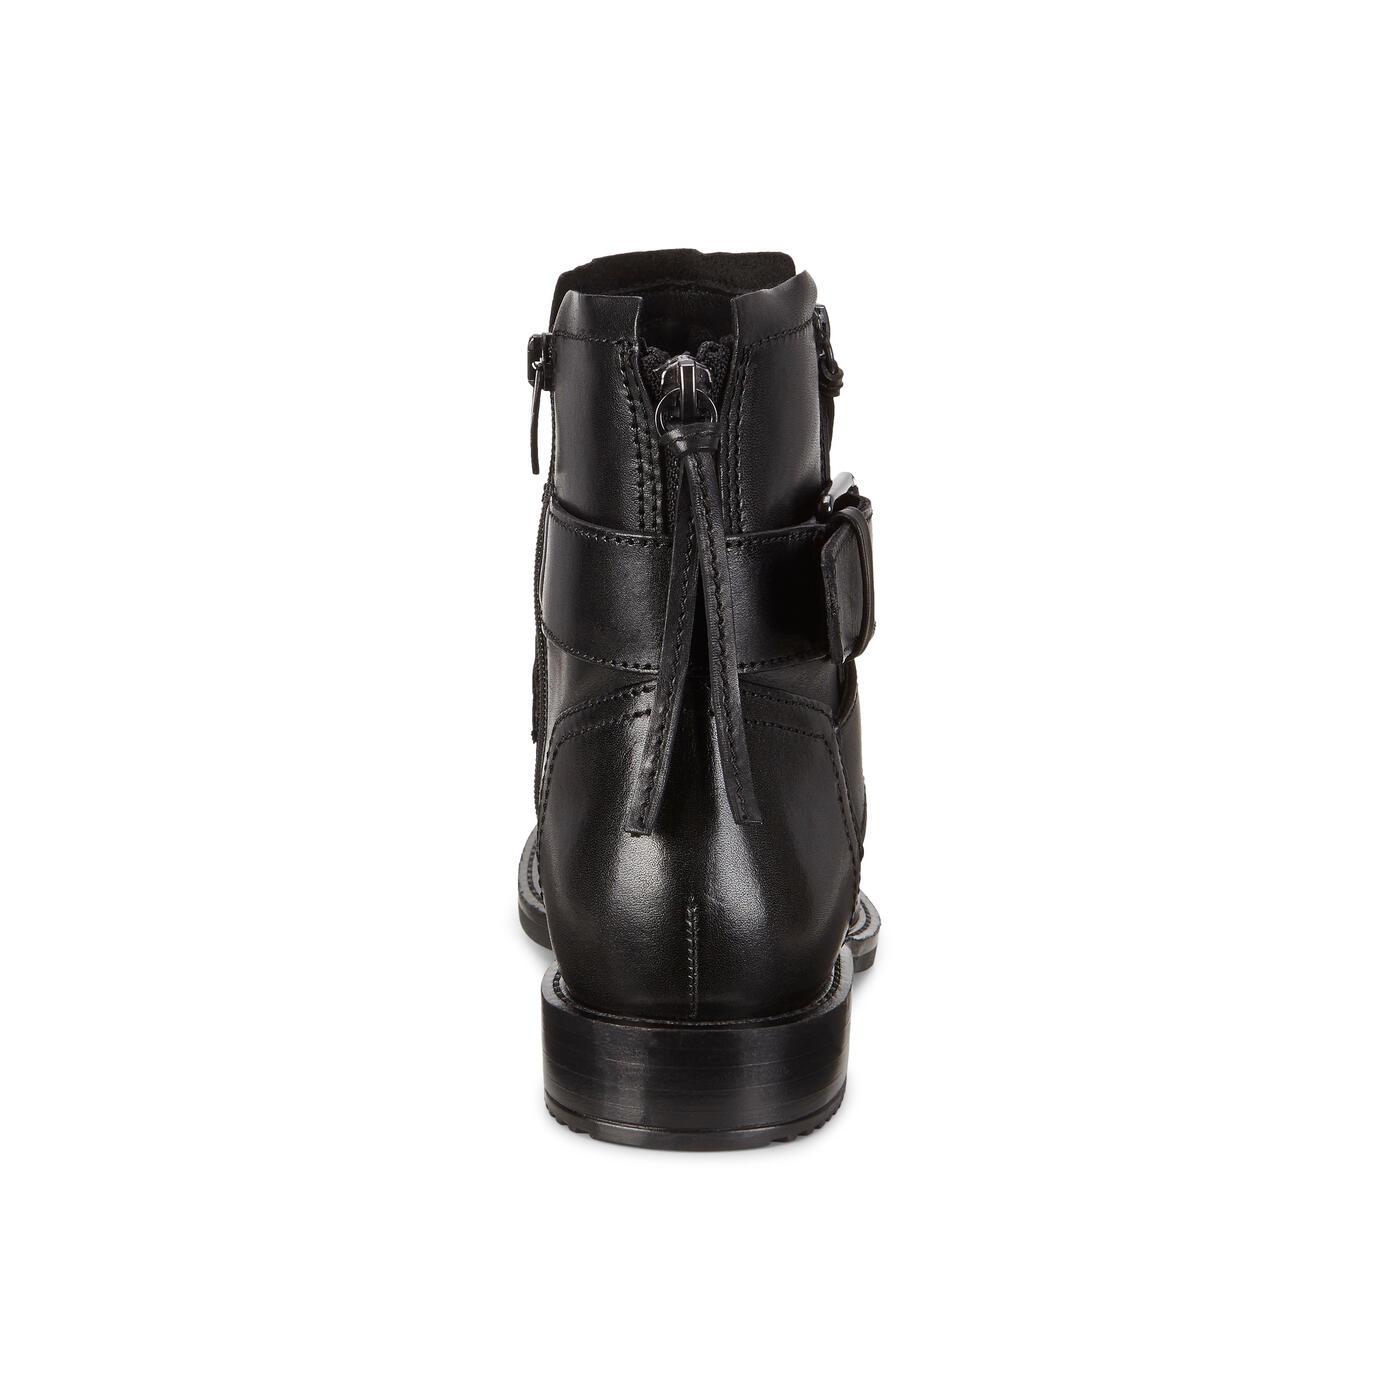 ECCO SARTORELLE Engineer Boot 25mm